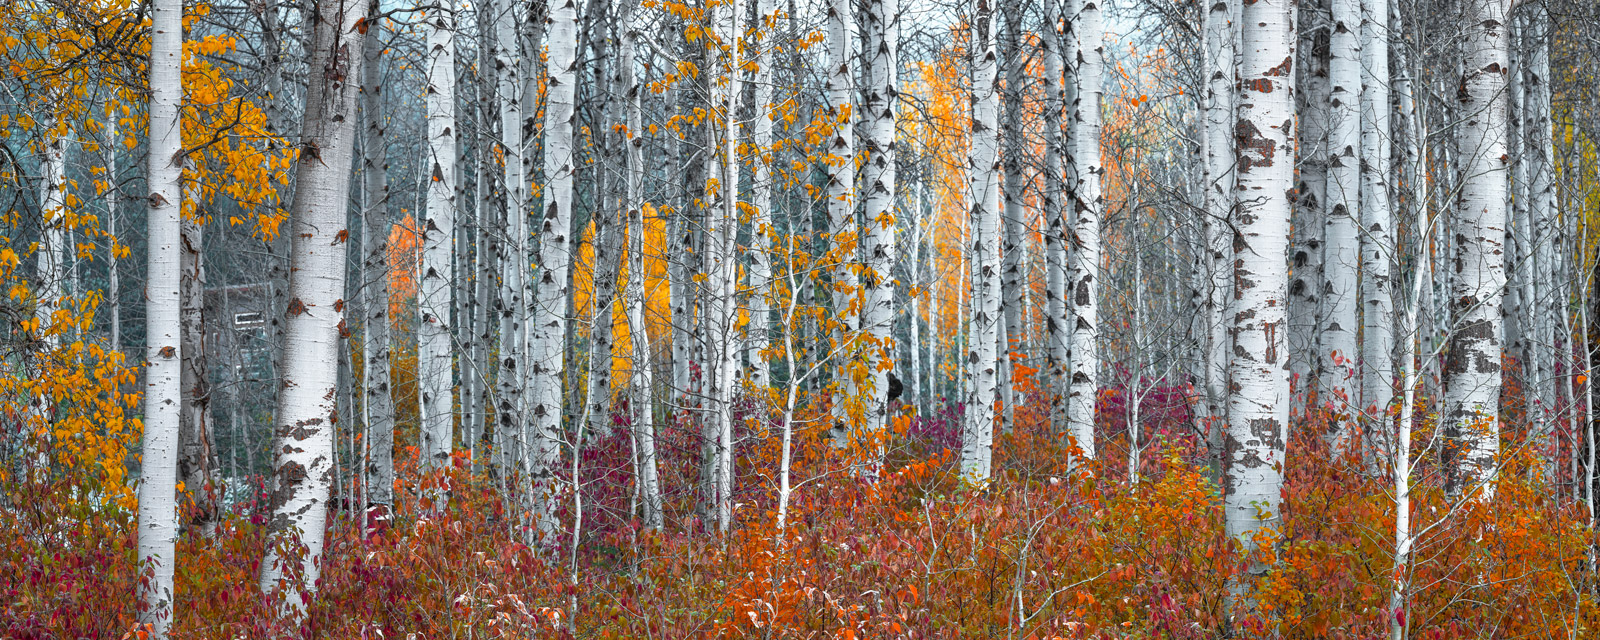 Washington, Fall, fall color, birch, trees, photo